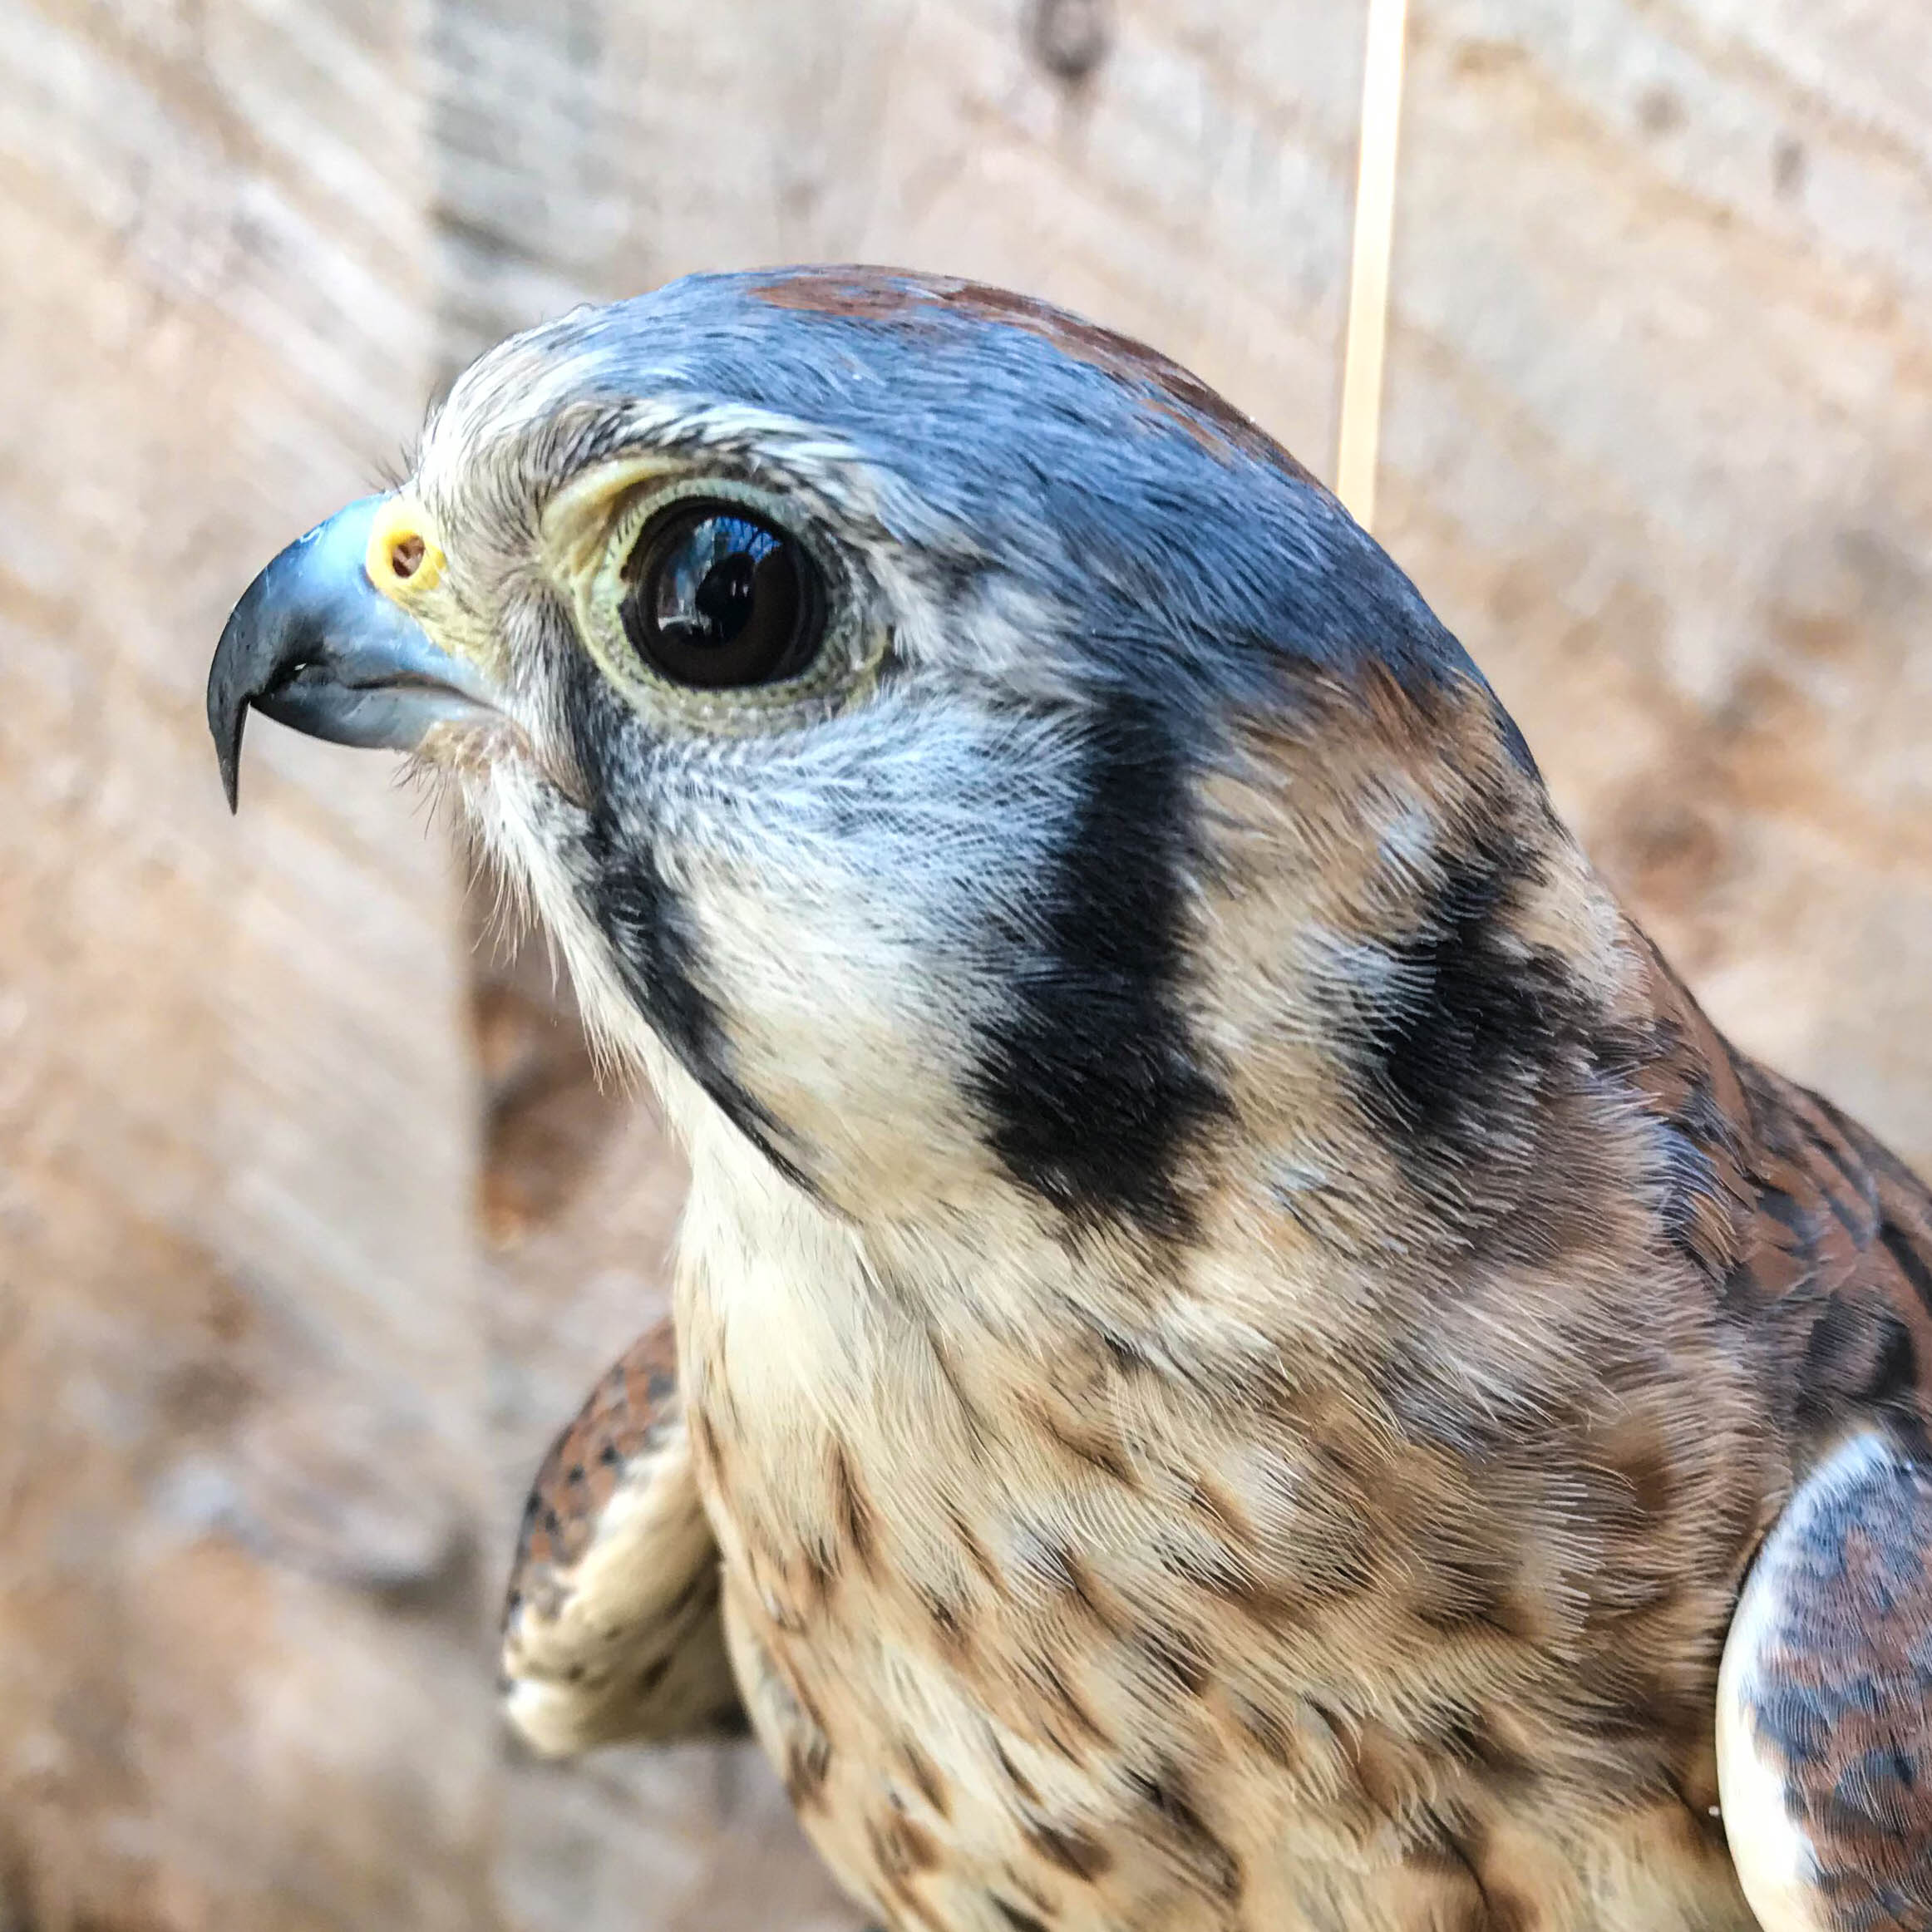 Banshee - American Kestrel (Falco sparverius)